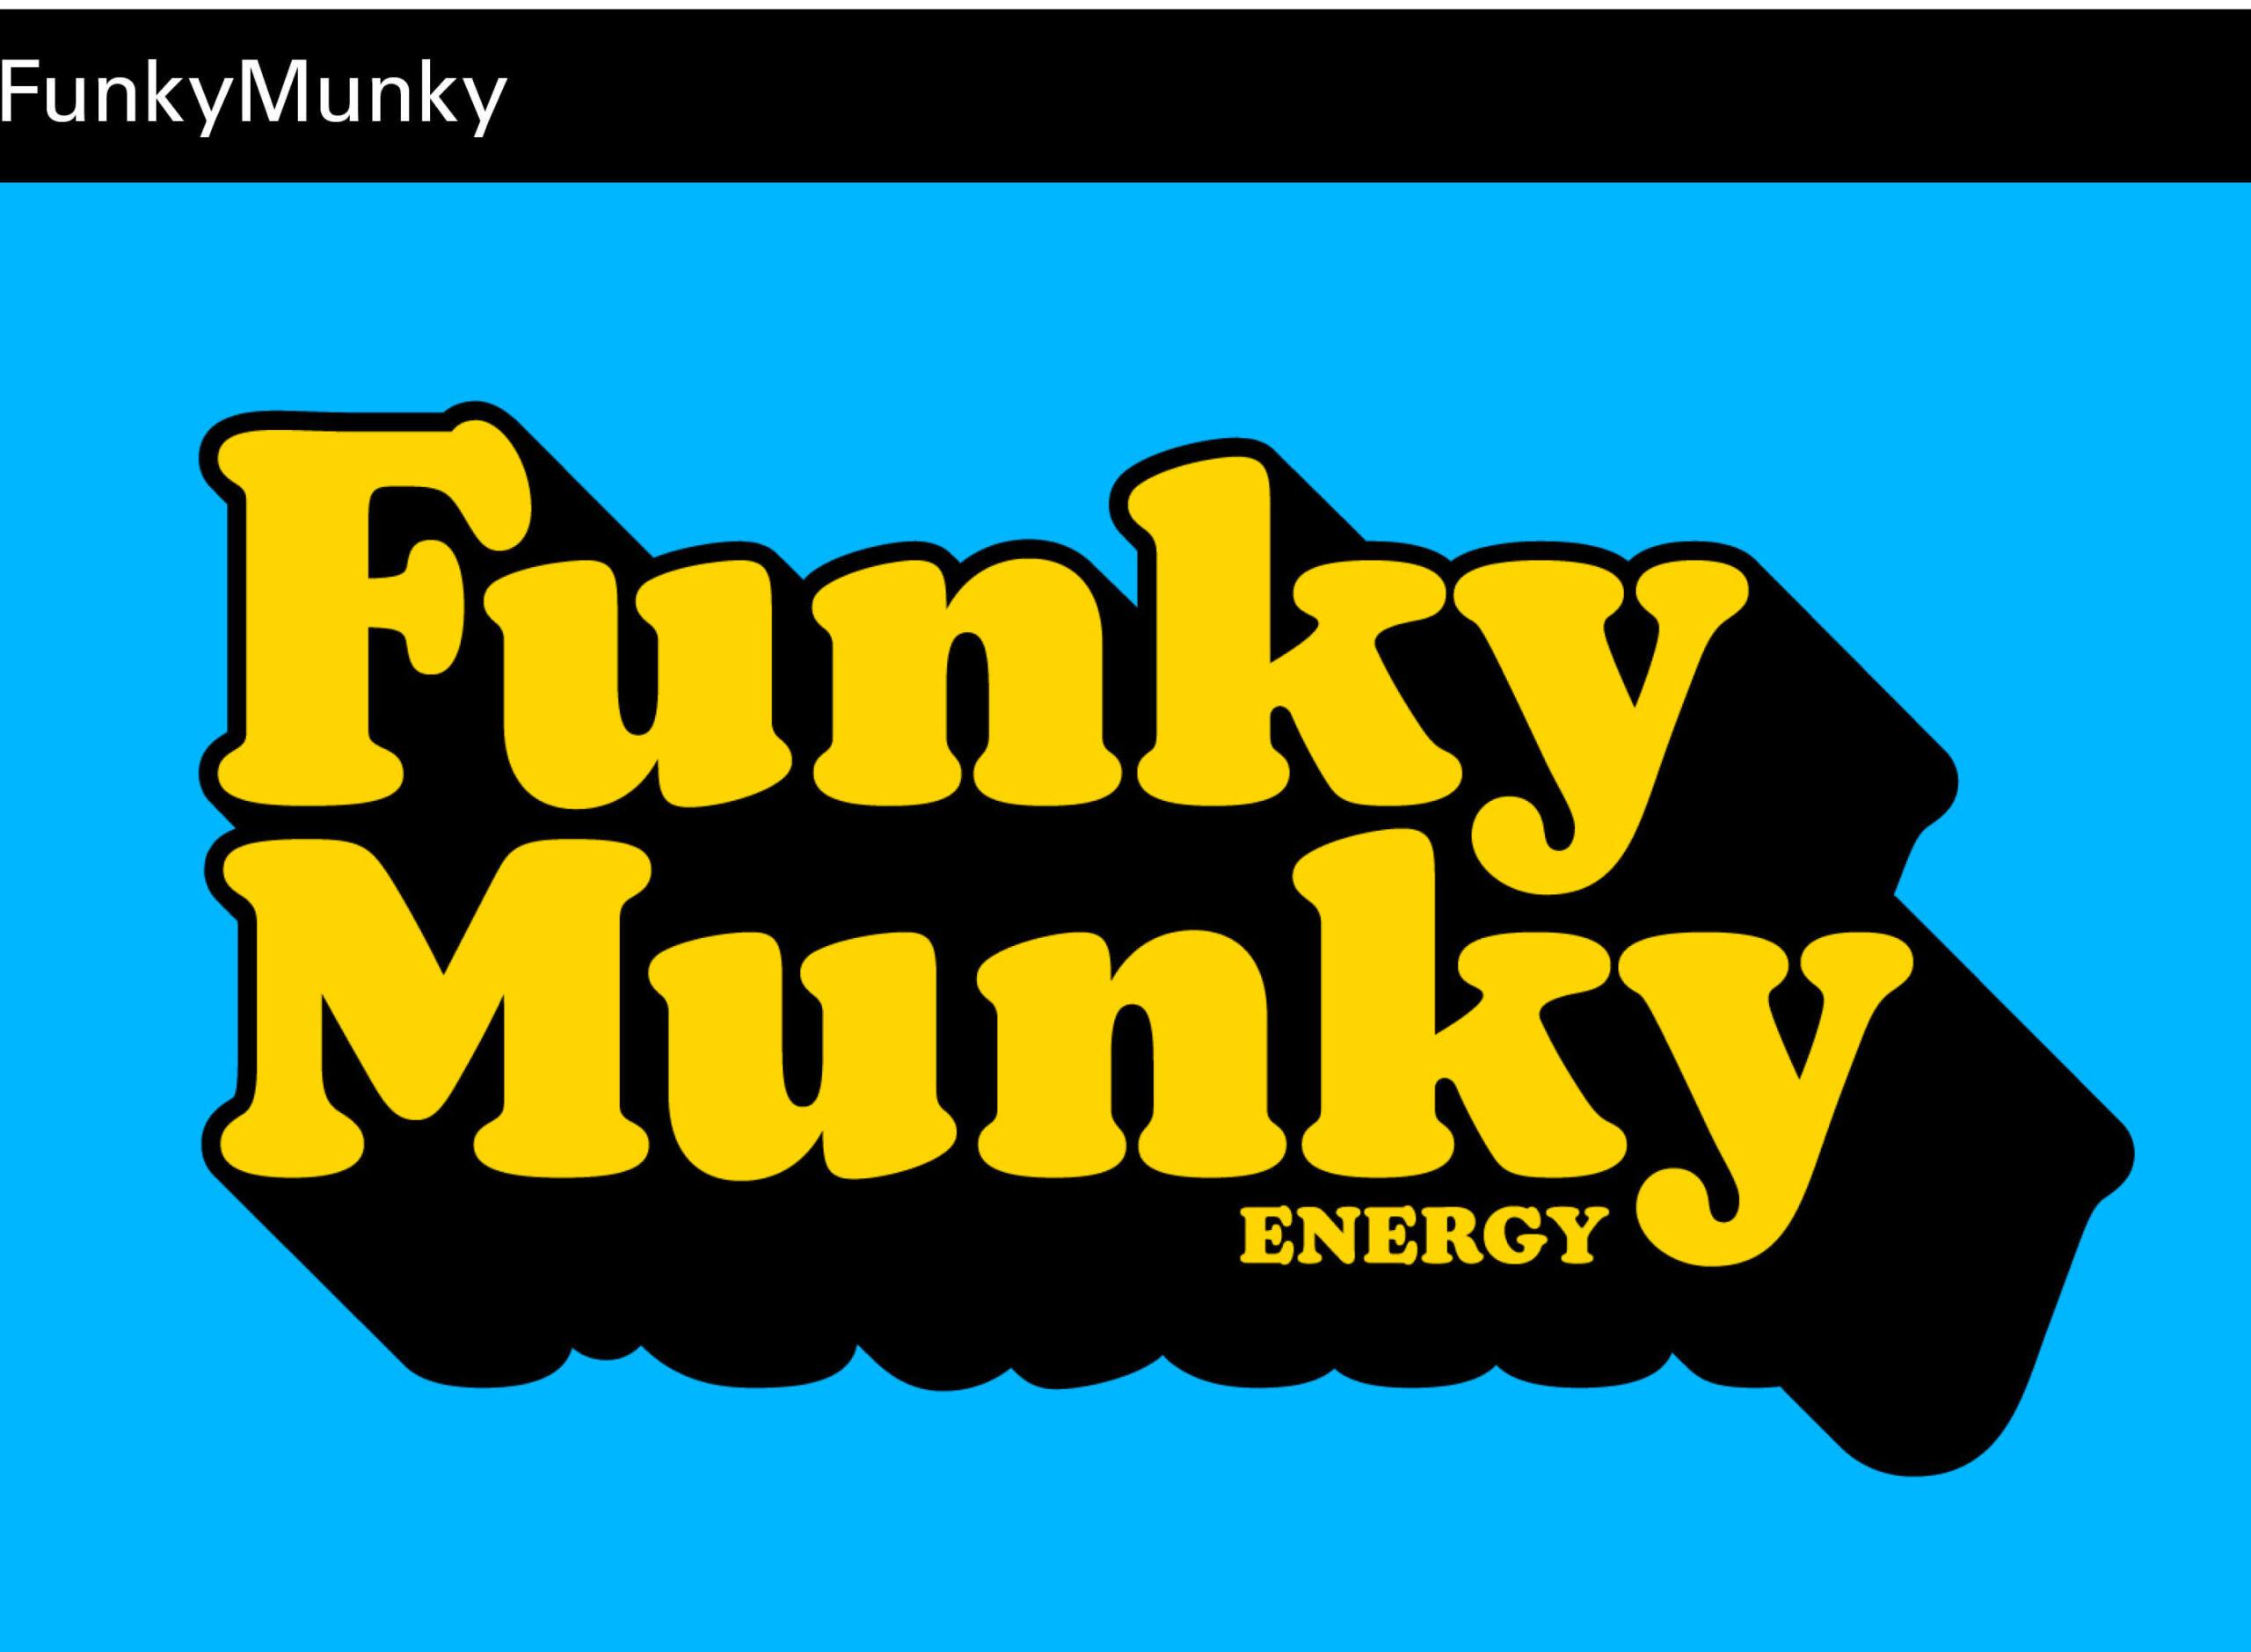 FunkyMunky